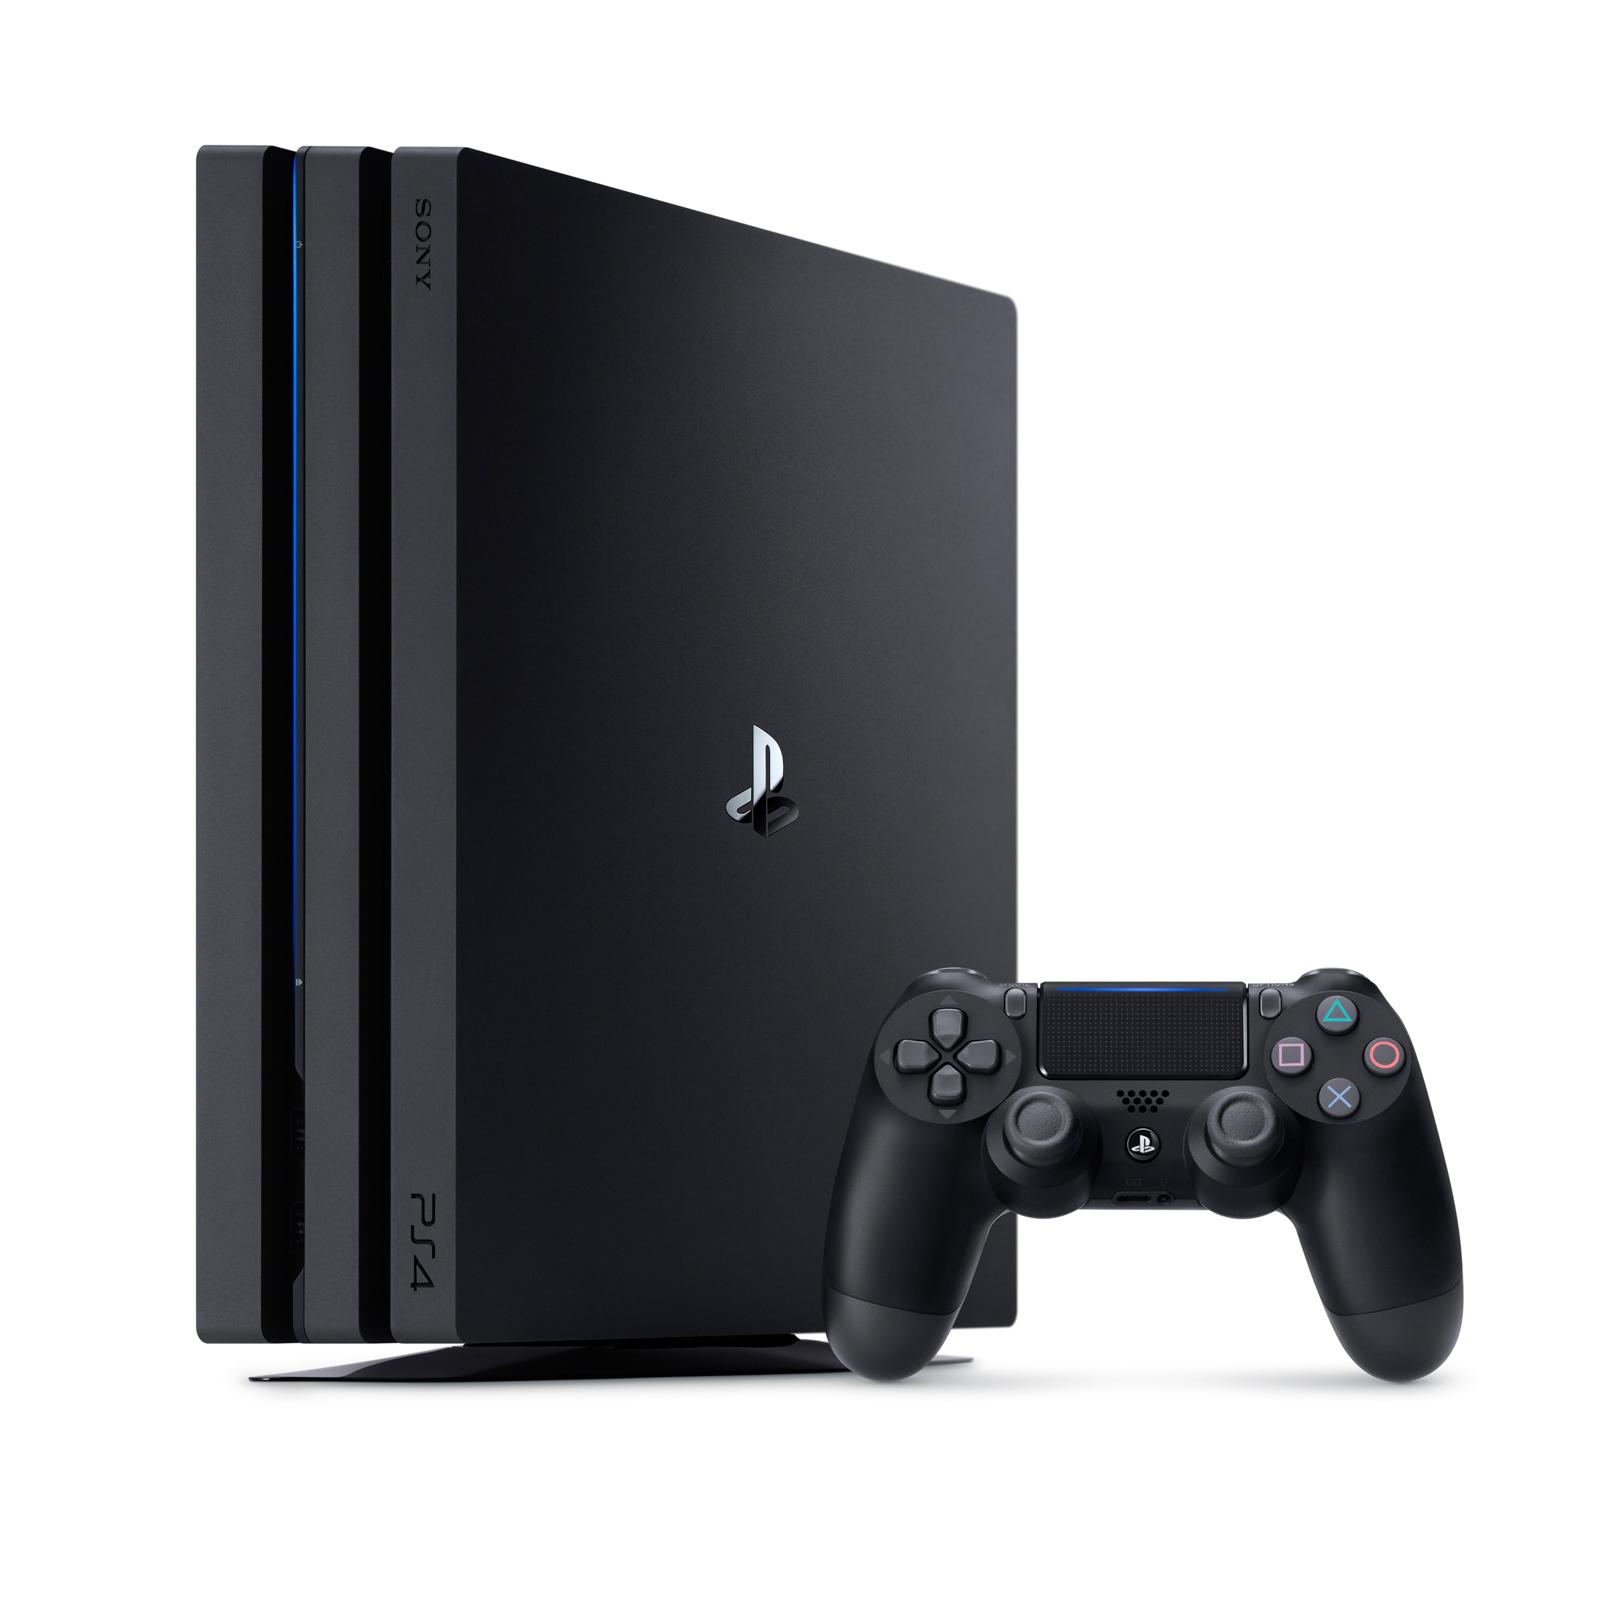 PS4 PRO - 500,000